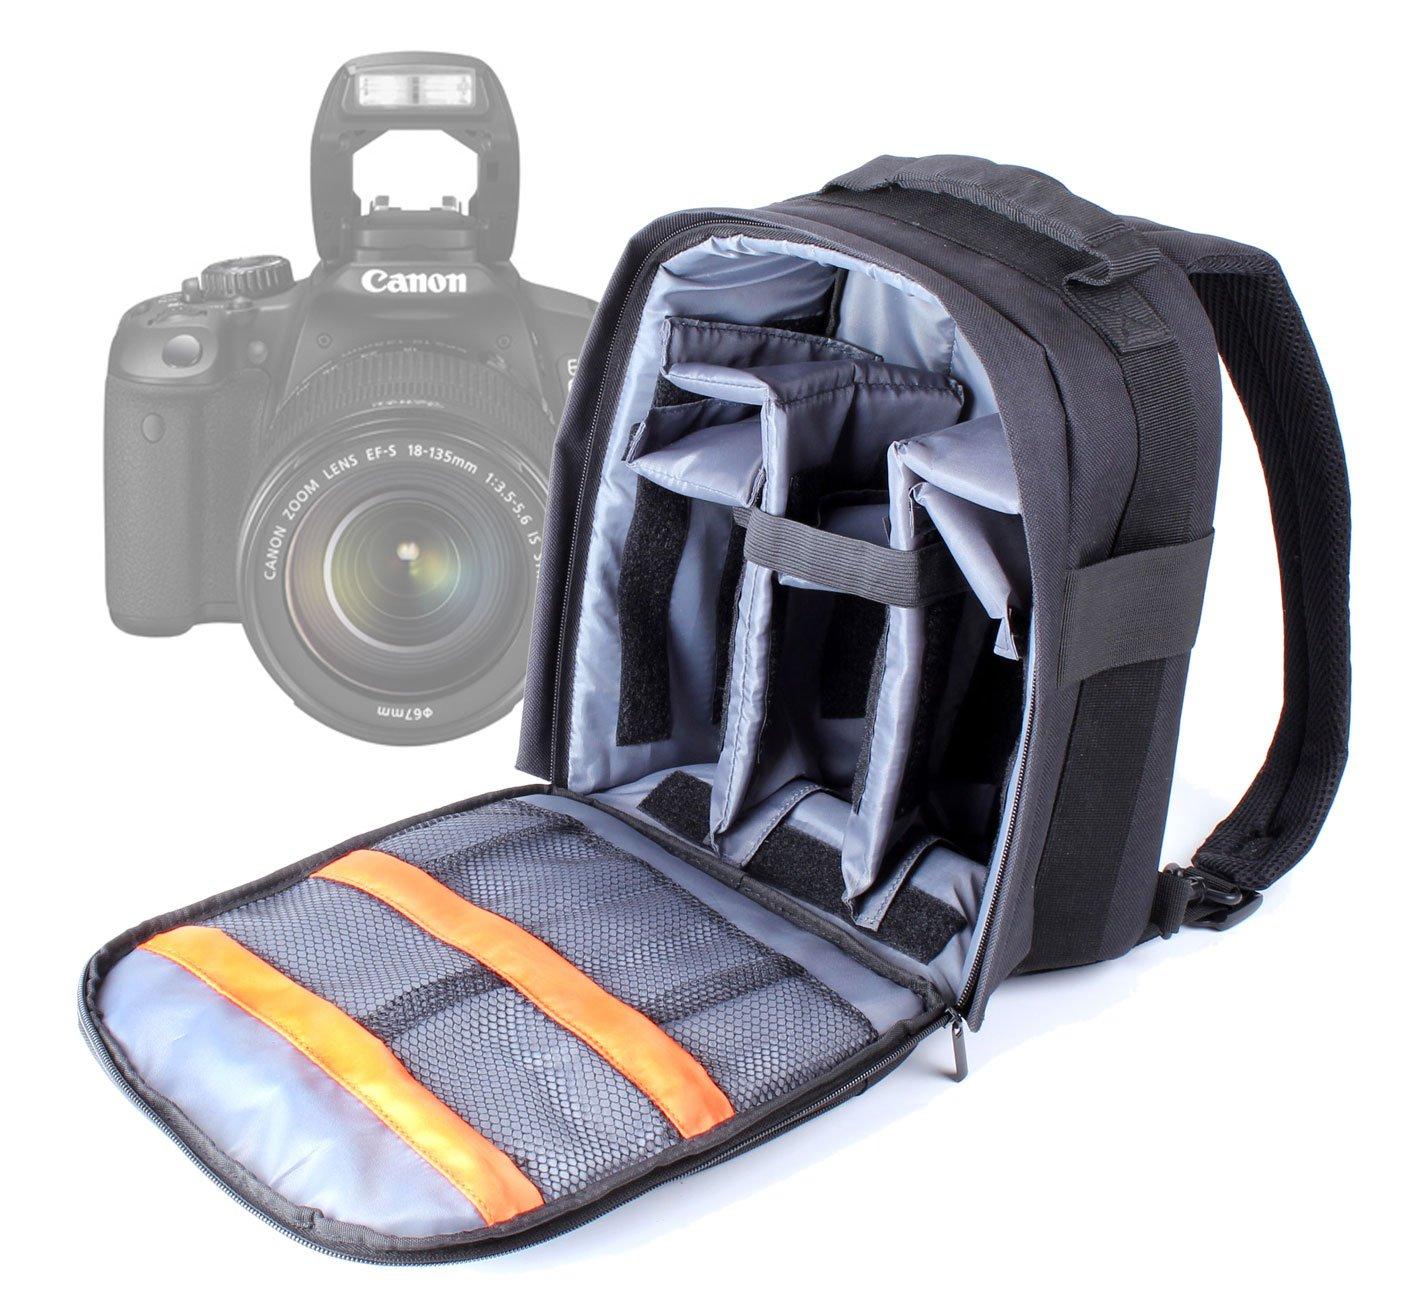 DURAGADGET DSLR Camera Backpack / Rucksack with Adjustable Padded Interior for Canon EOS 350D Digital SLR Camera (18-55mm Lens Kit)